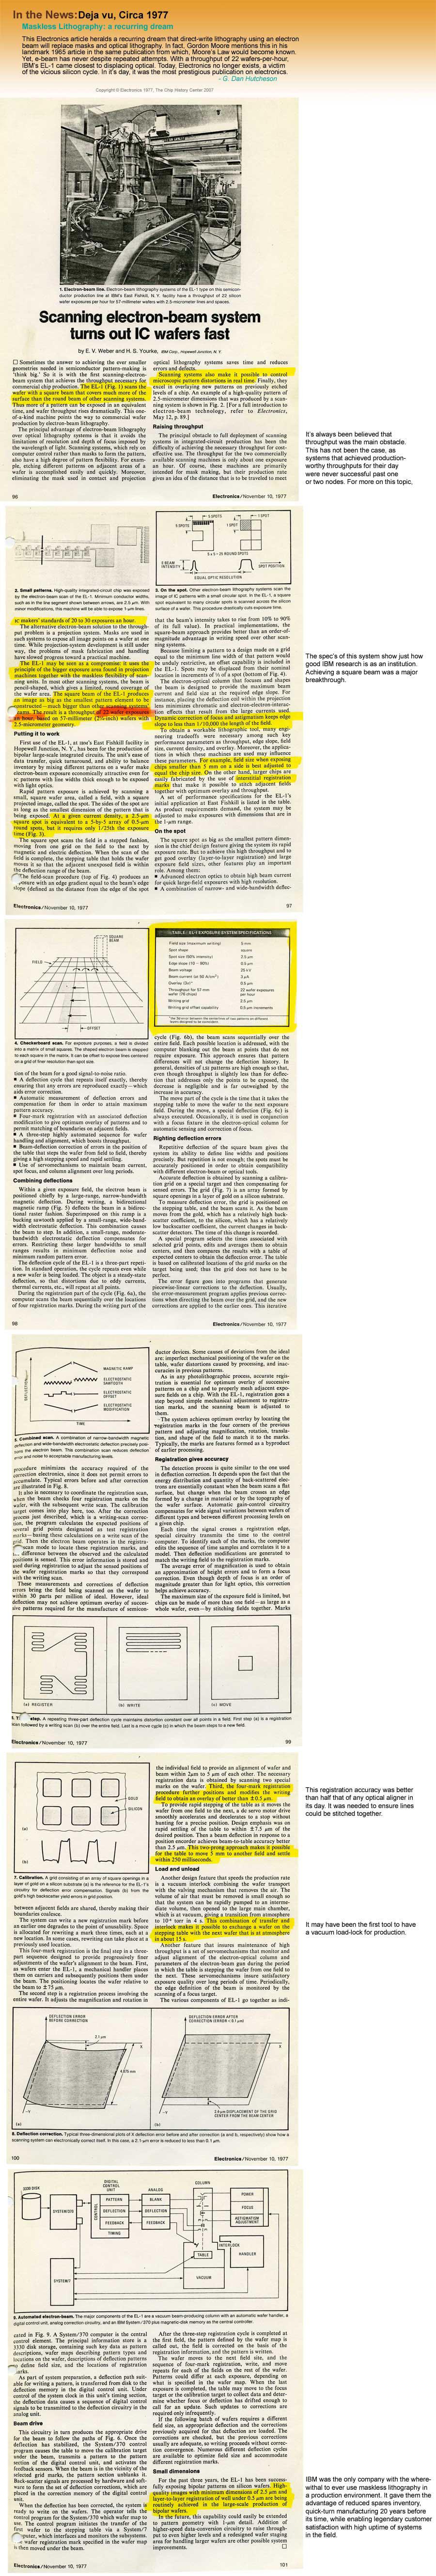 In the News: Deja vu, Circa 1977